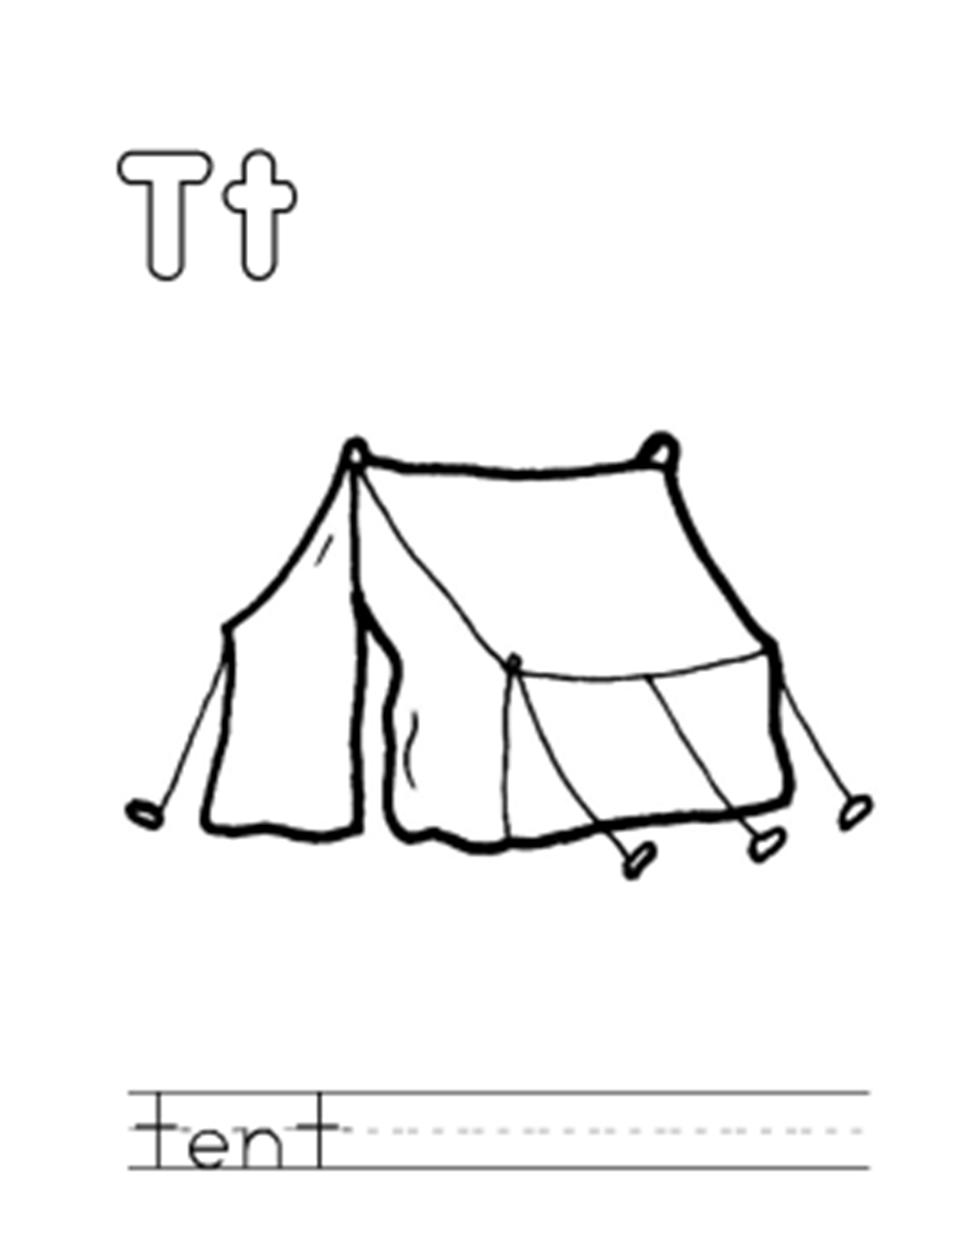 Tent coloring #13, Download drawings